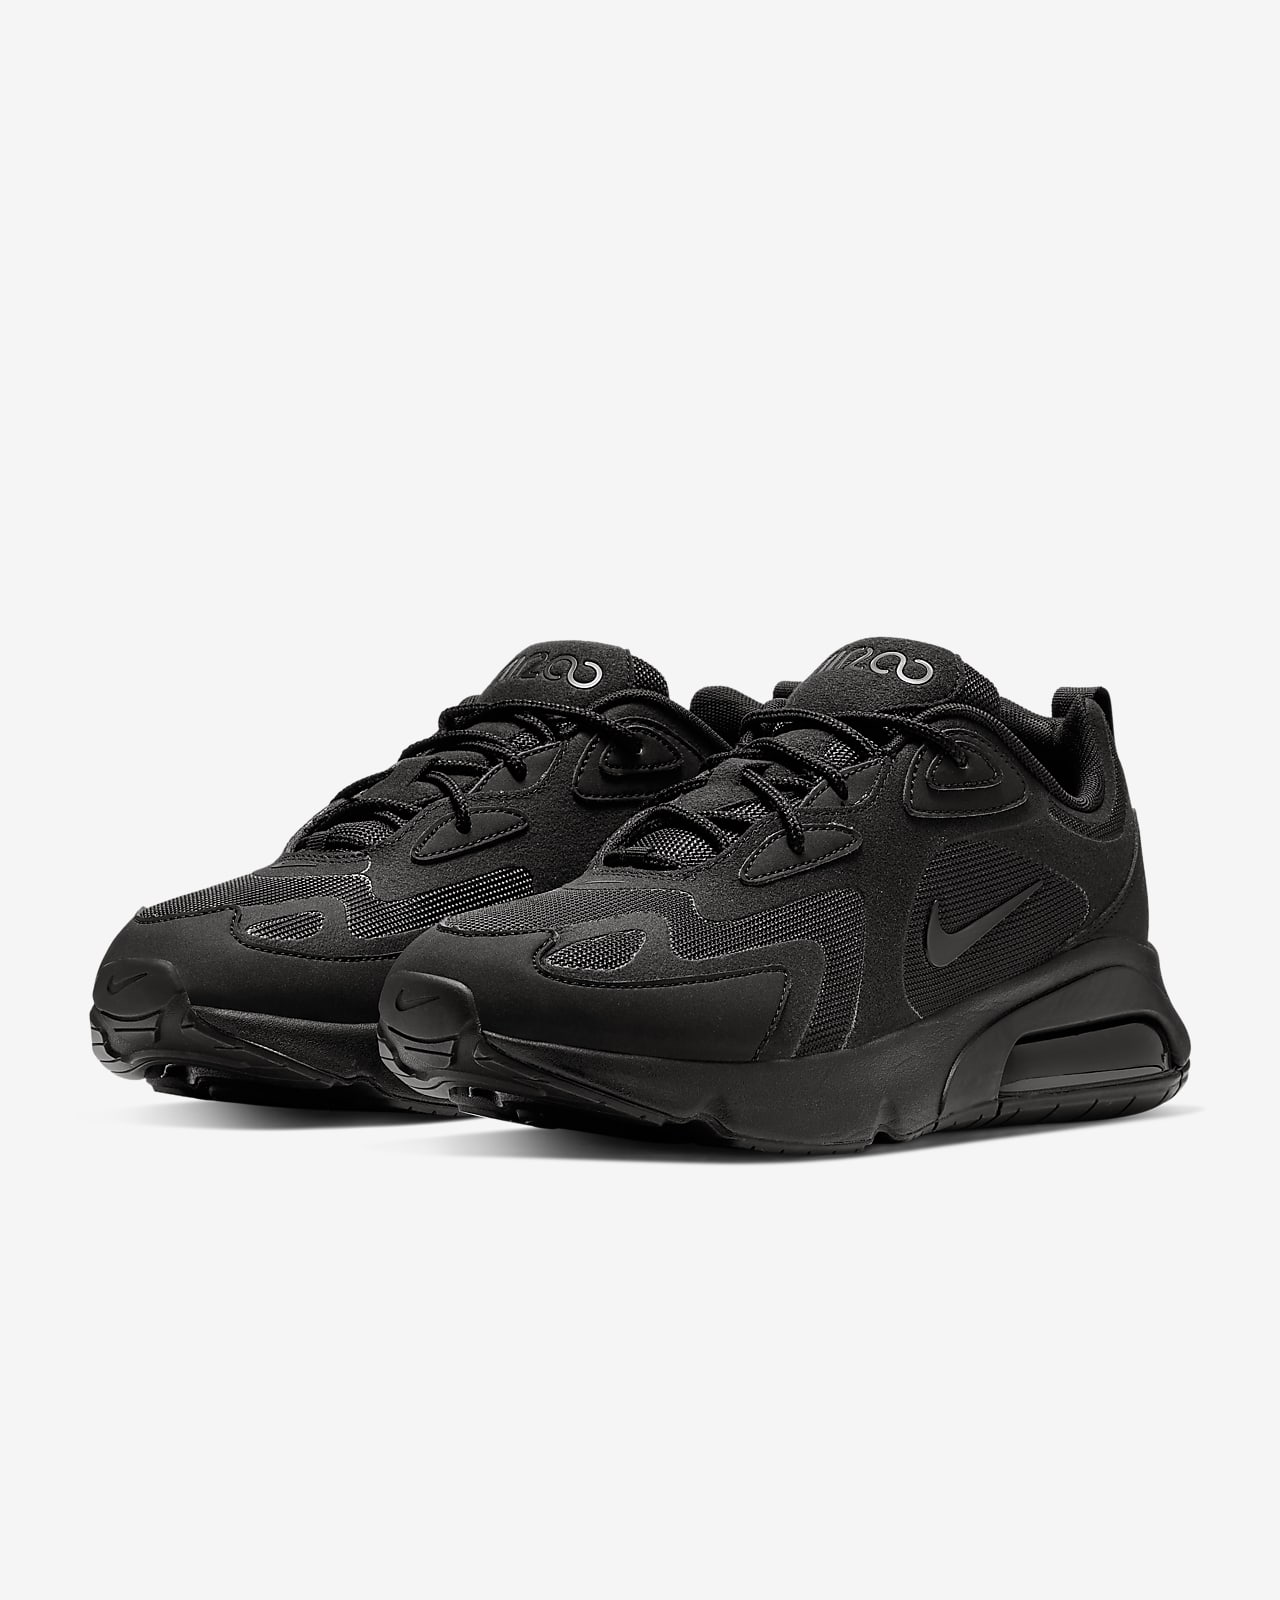 Nike Air Max 200 Men's Shoe. Nike SG